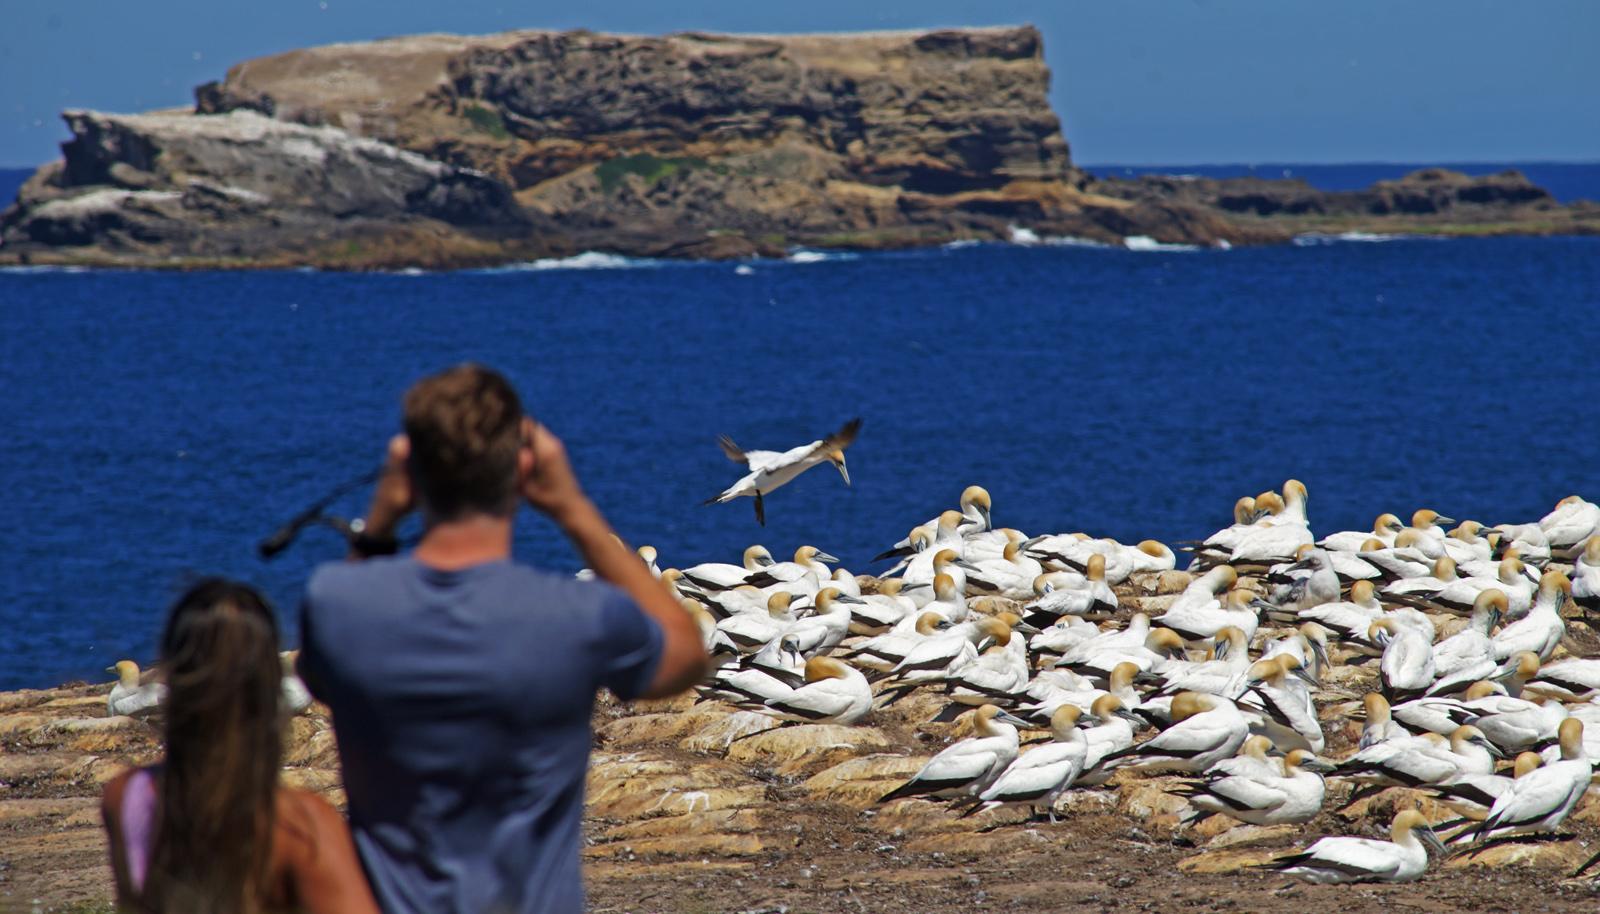 GANNETS - Lawance Rocks, Australia's largest breeding colony of Australasian Gannets.